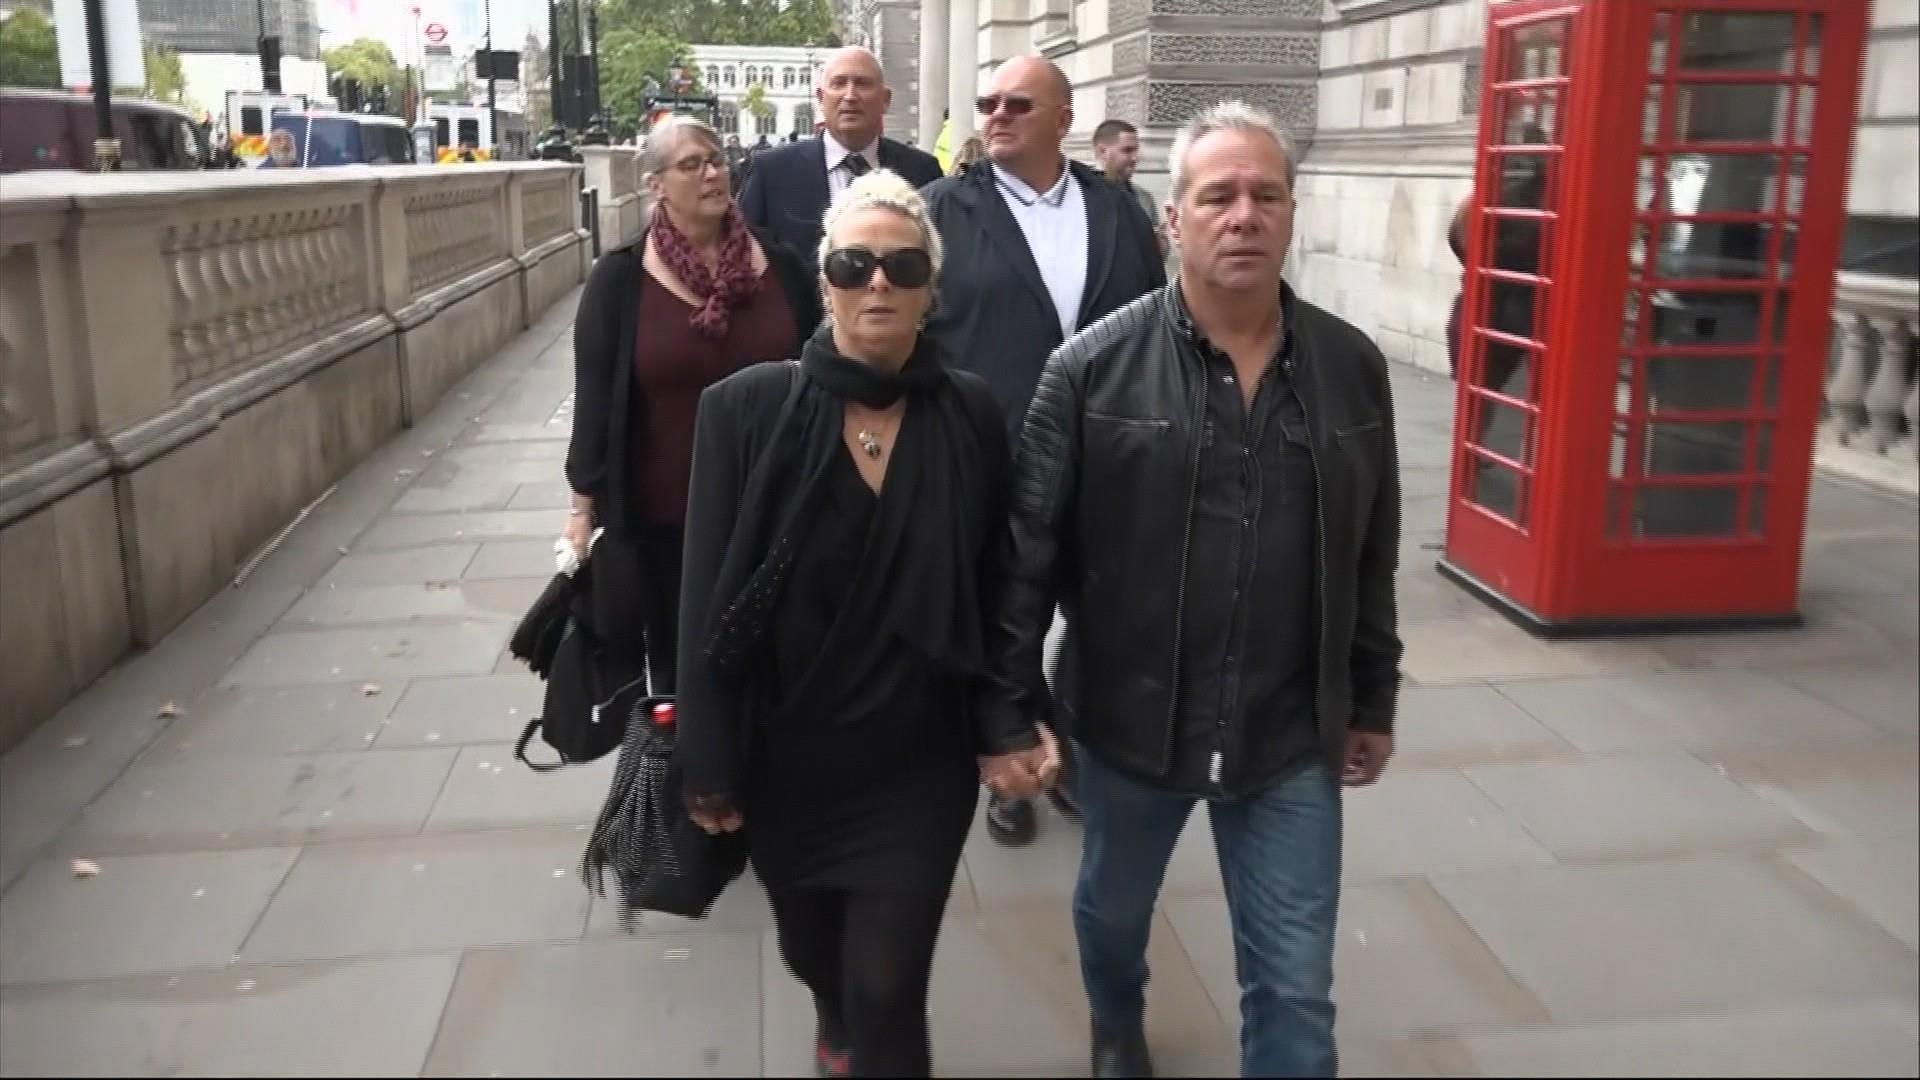 U.S. diplomat's wife involved in fatal U.K. crash apologizes to victim's family